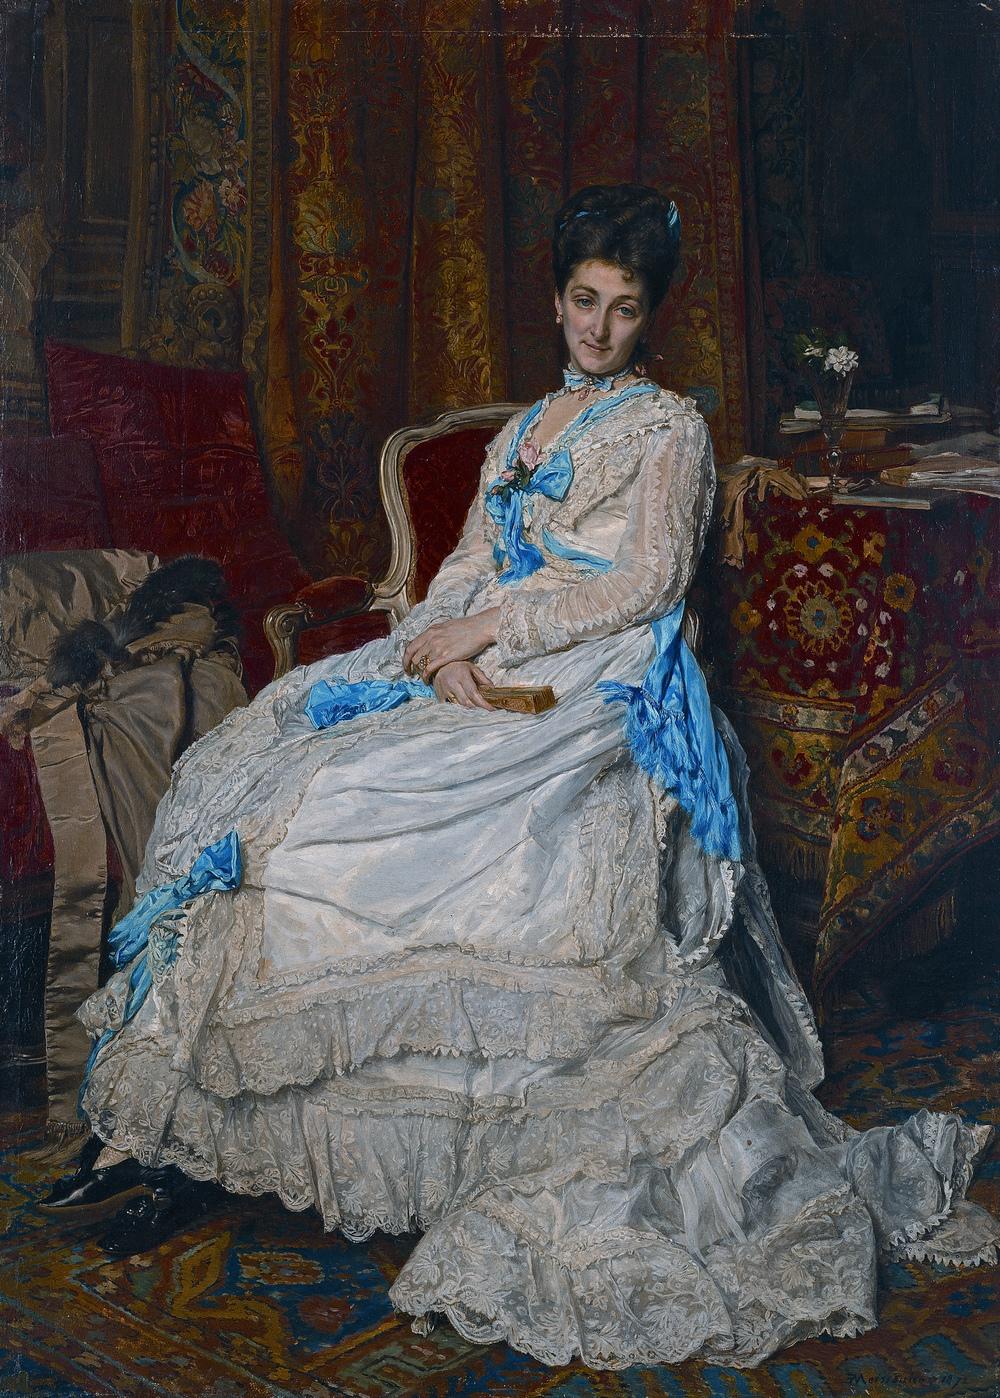 Jean-Louis-Ernest Meissonier,  The Marchioness of Manzanedo , 1872, Prado Museum, Madrid.